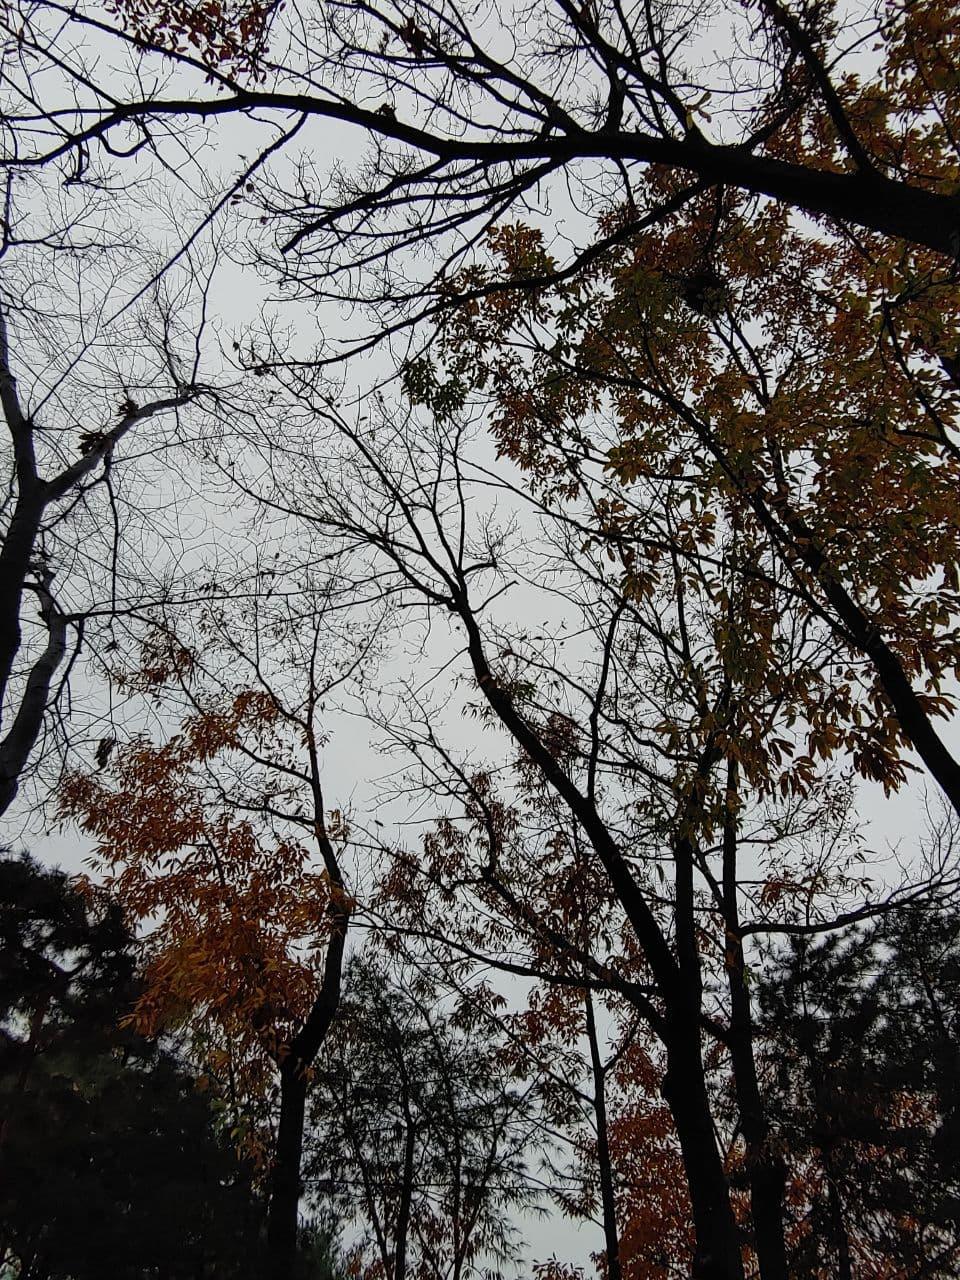 photo_2020-11-19_22-50-50.jpg